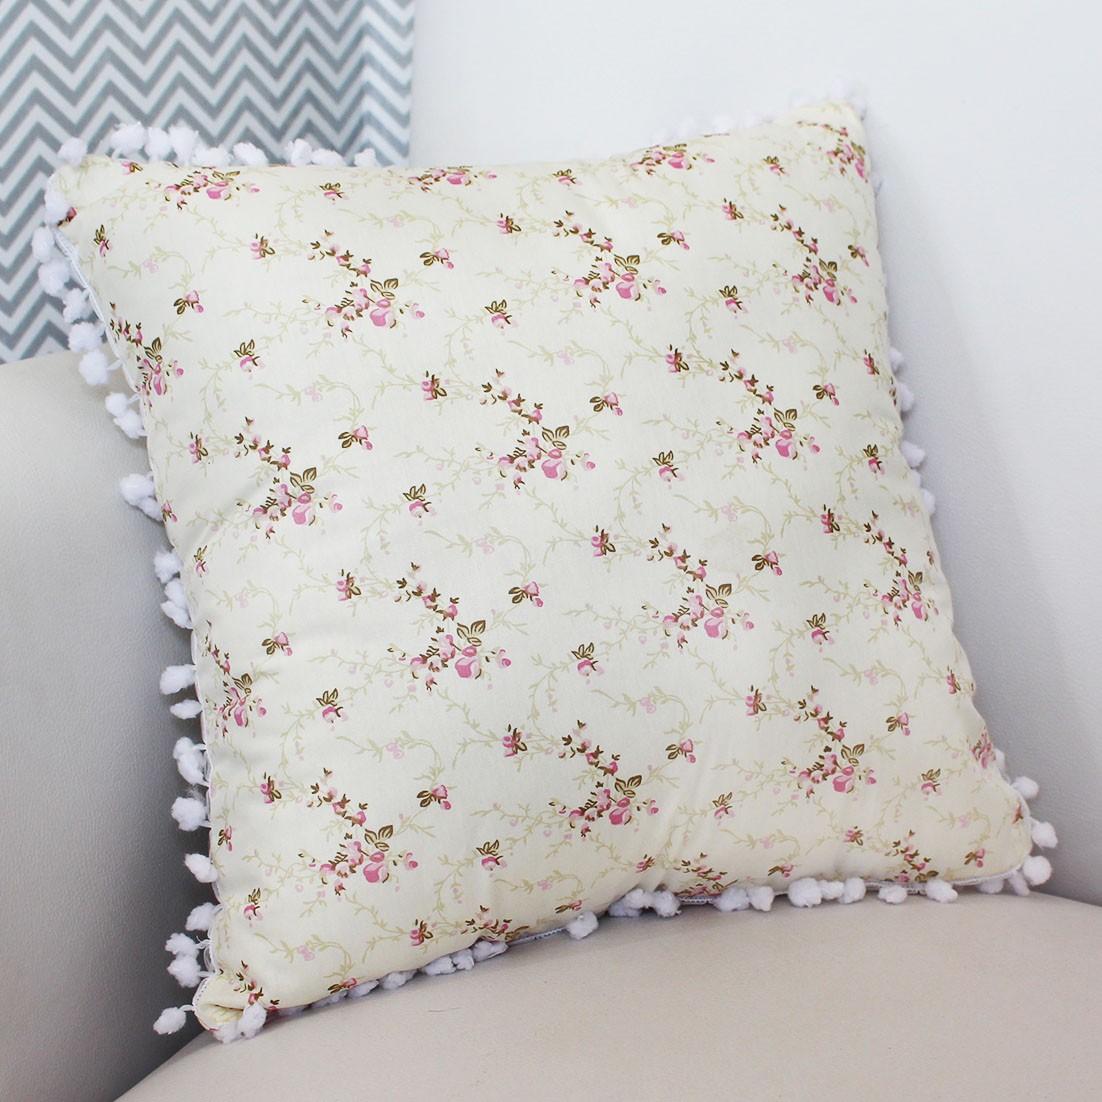 Almofada Decorativa Estampada Nervura Floral Rosa